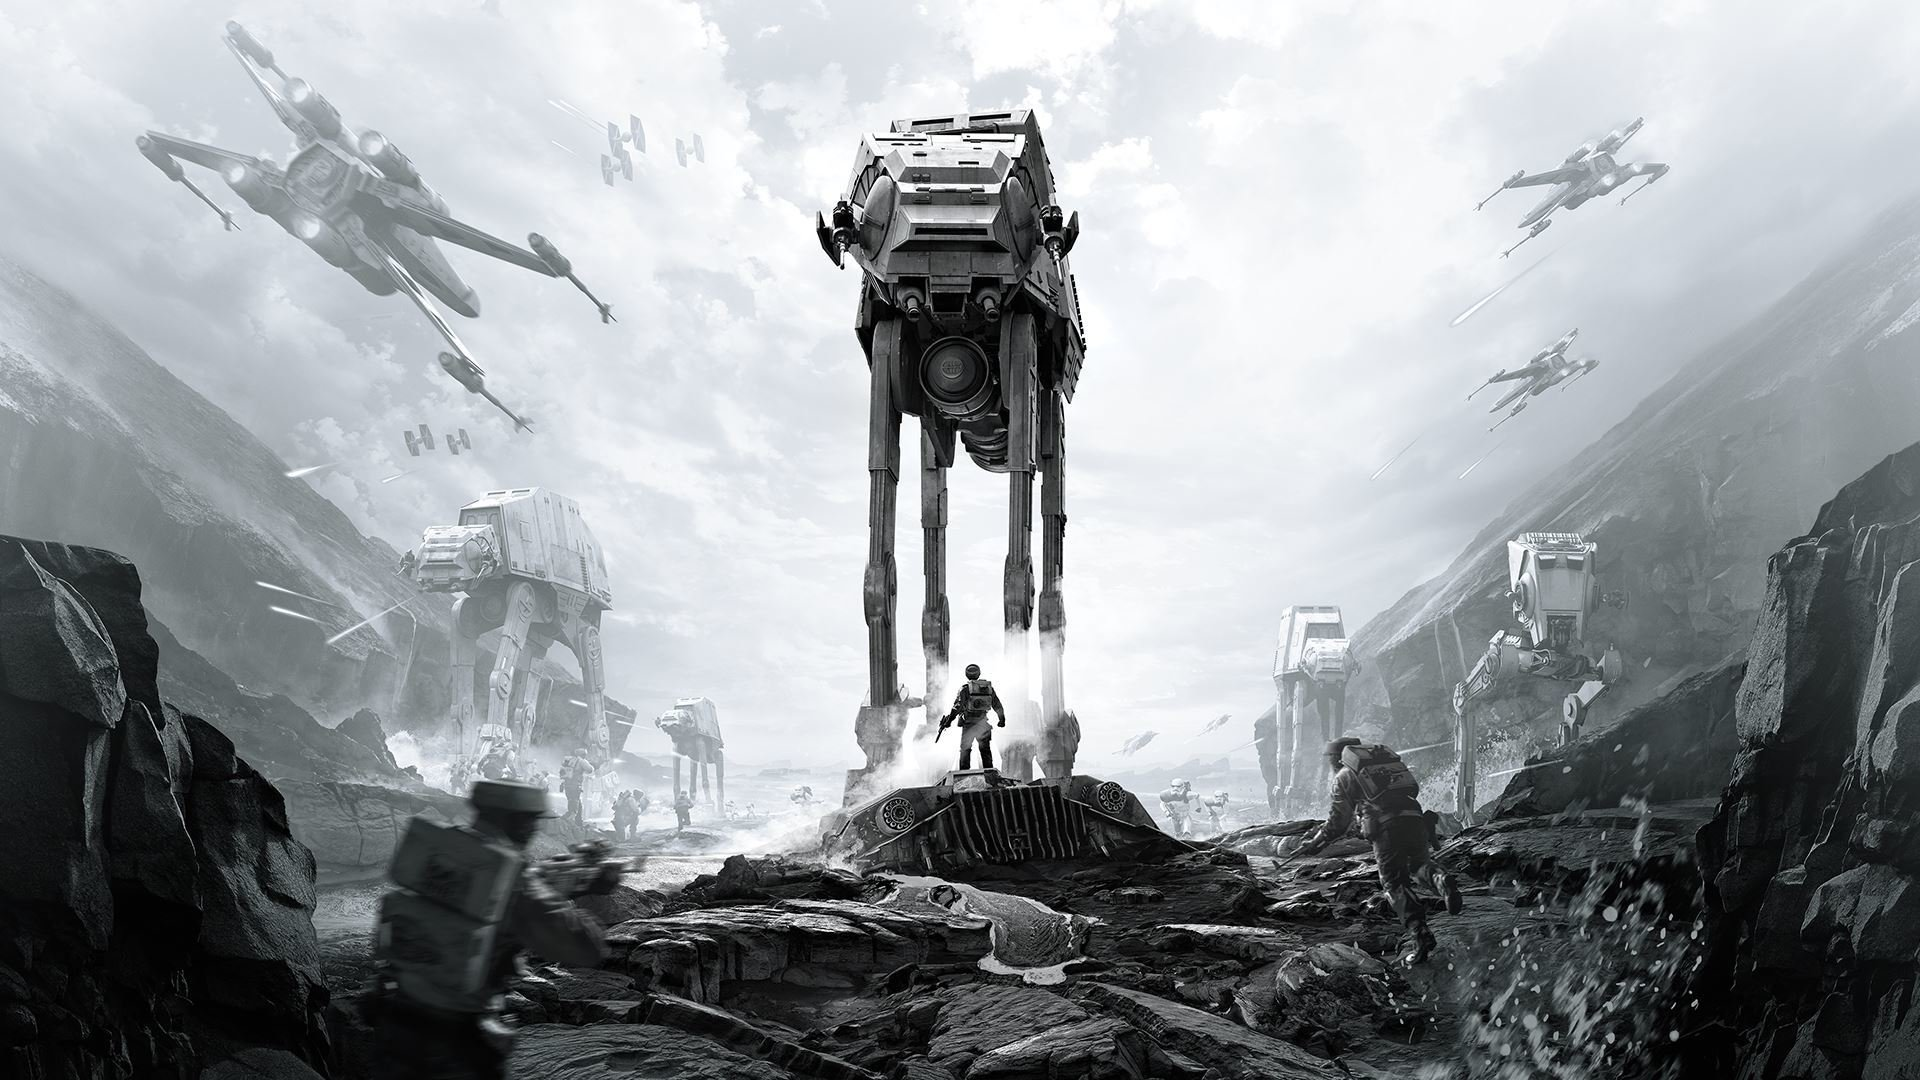 Star wars battlefront 2015 fondo de pantalla hd fondo for Fondo de pantalla star wars